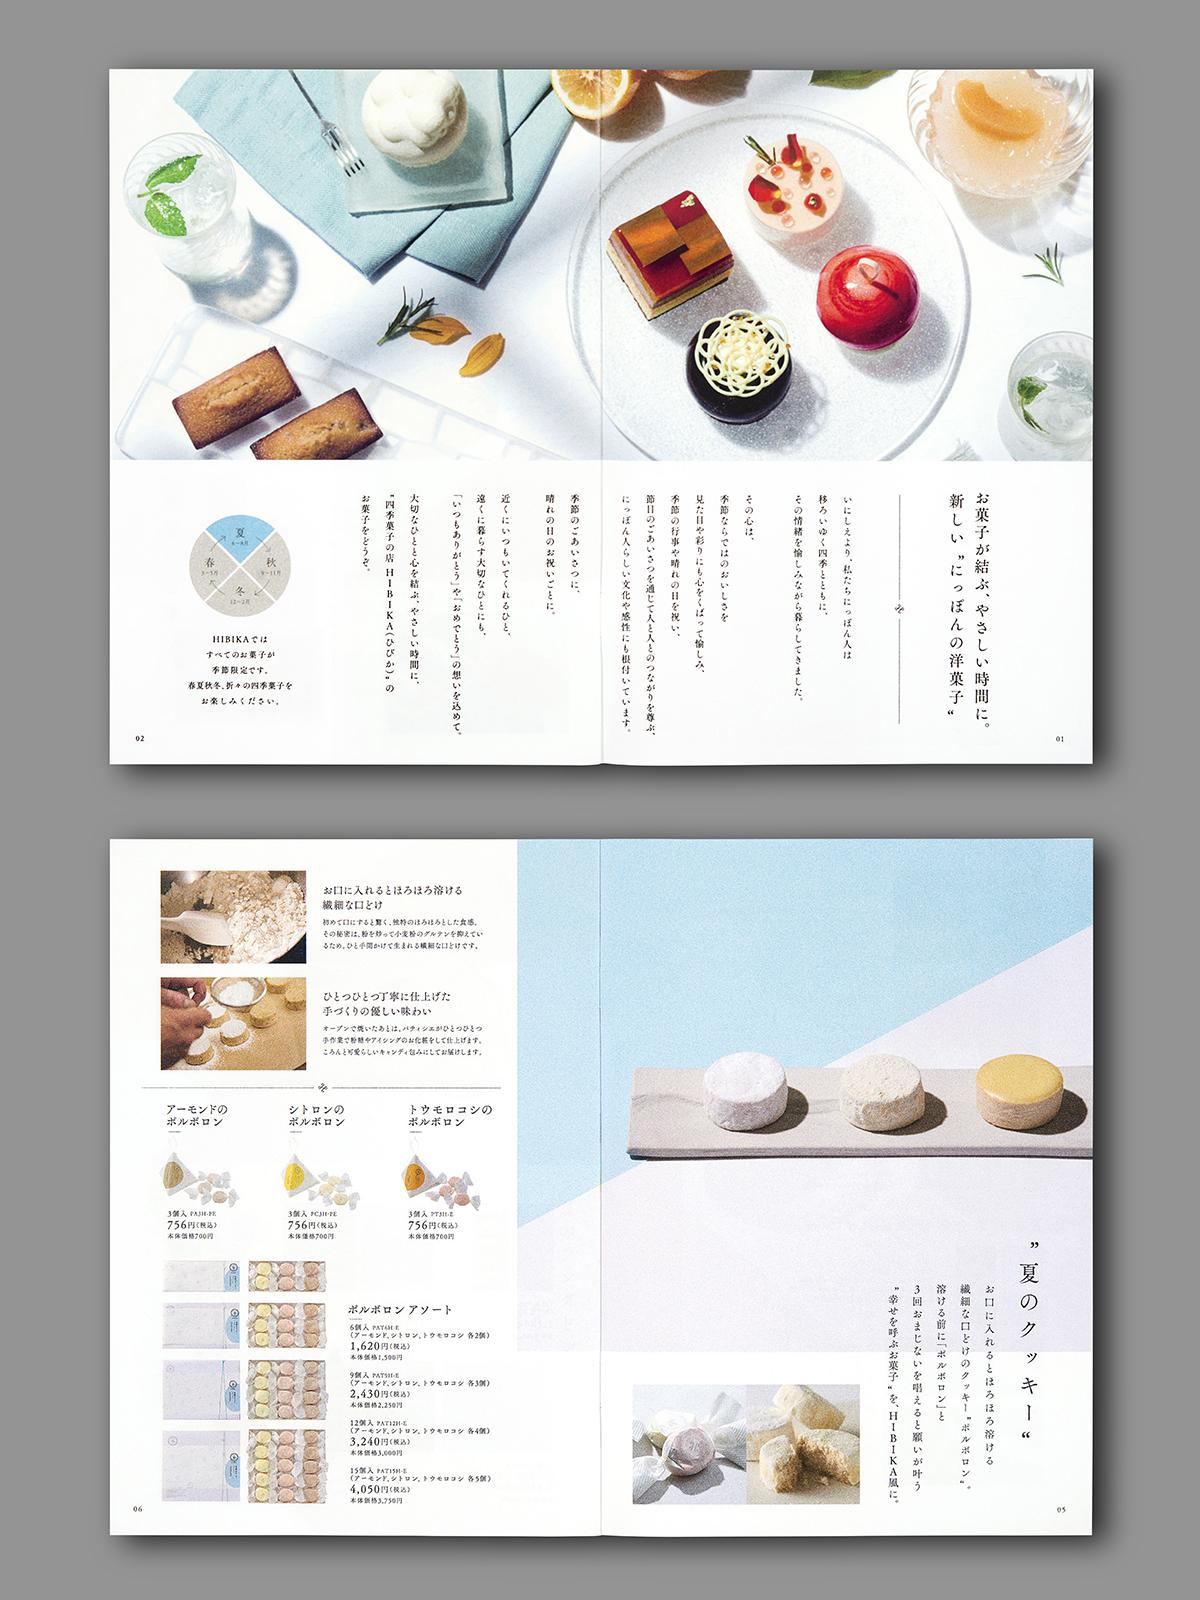 HIBIKA 2020夏季 商品カタログの画像1